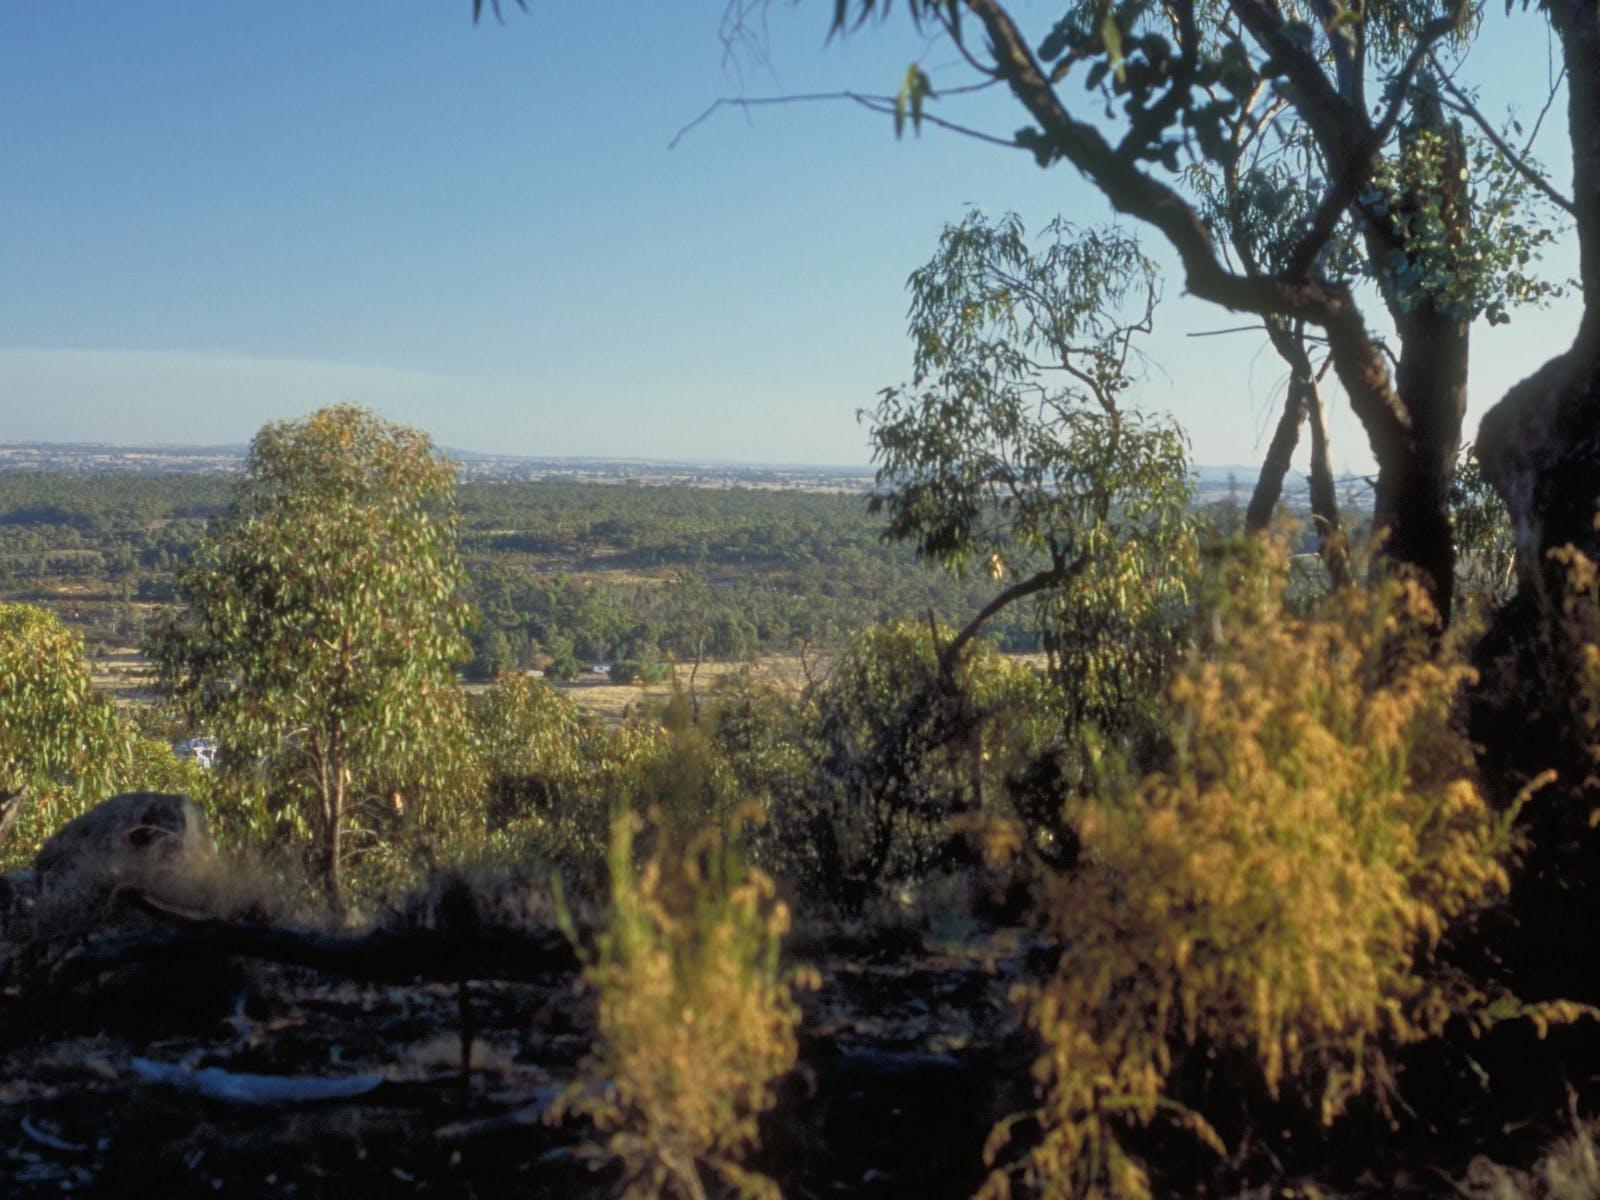 Heathcote-Graytown National Park